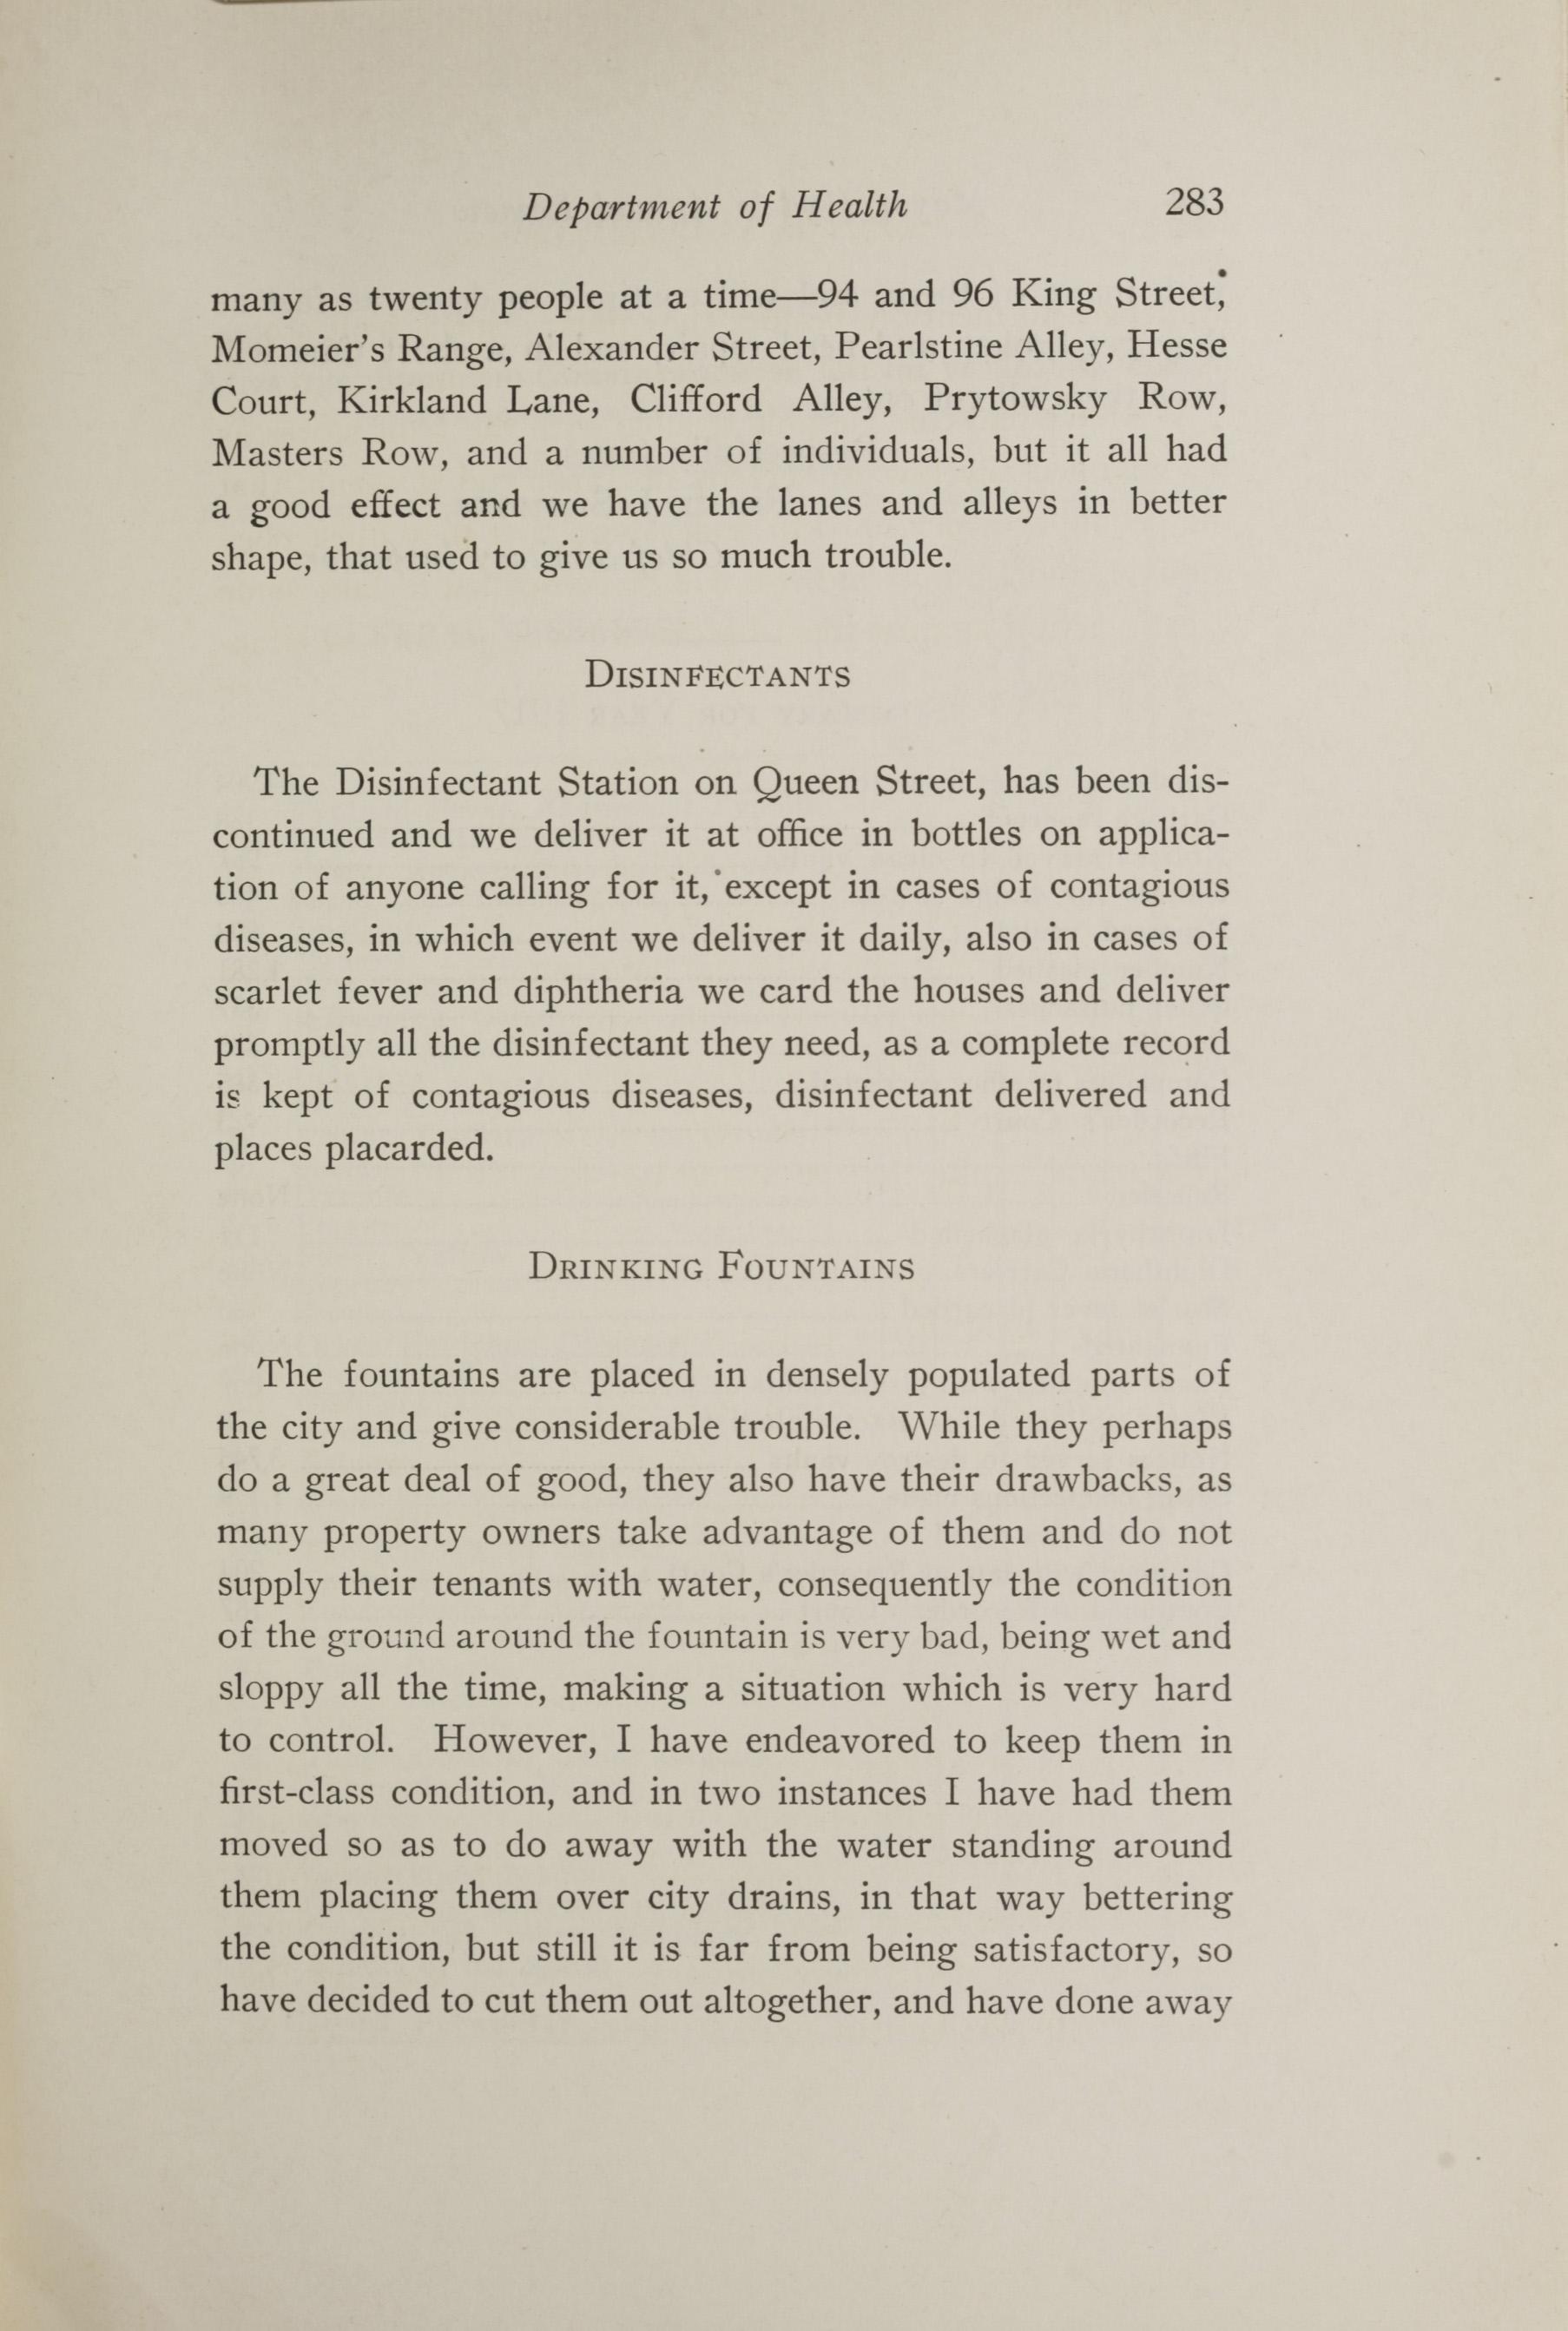 Charleston Yearbook, 1917, page 283